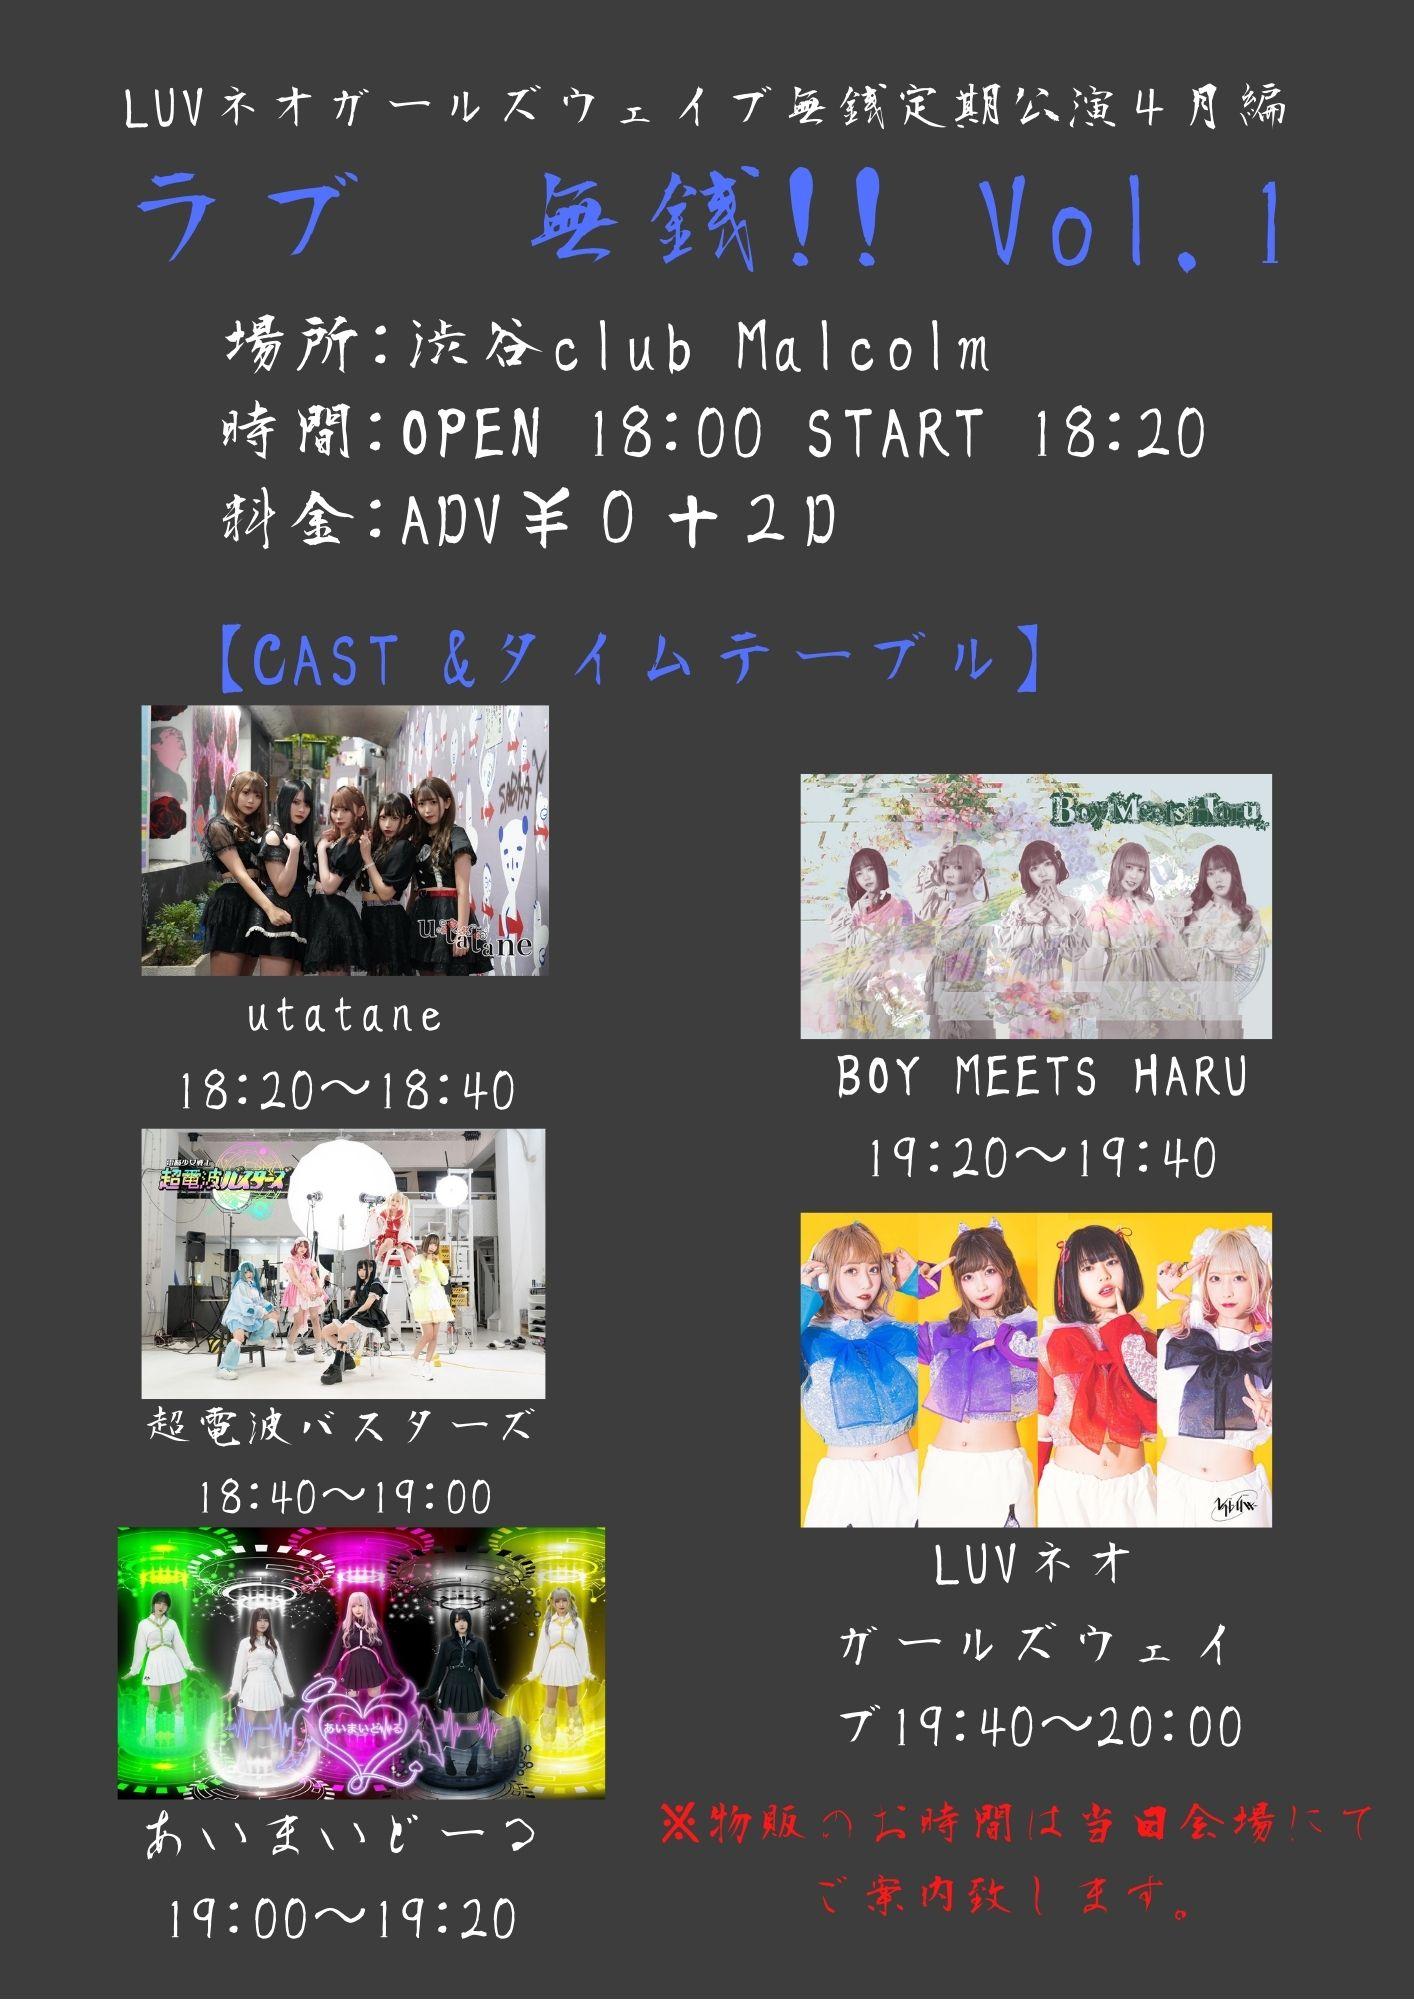 LUVネオ無銭定期公演4月編 「ラブ♡無銭!! Vol.1」